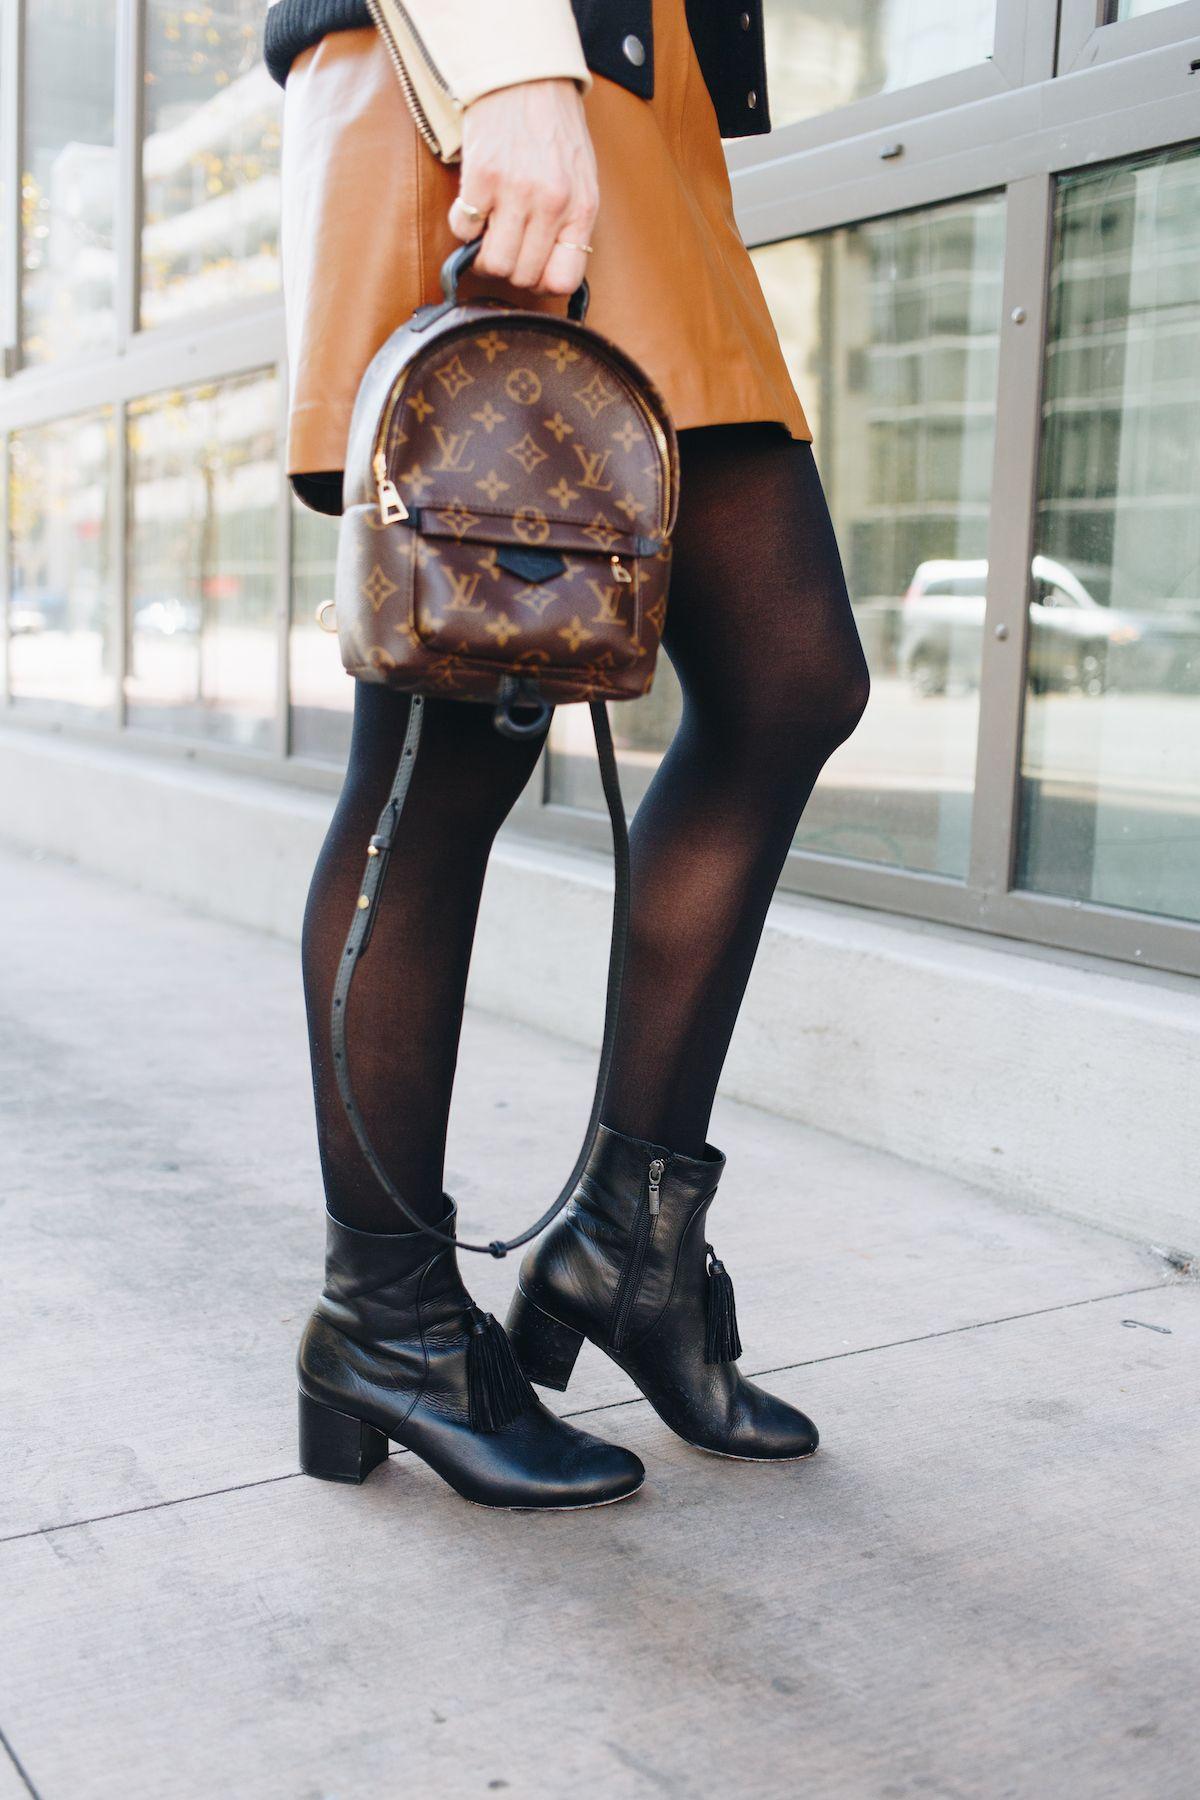 Louis Vuitton Mini Bag Mini bag, Leather backpack, Leather